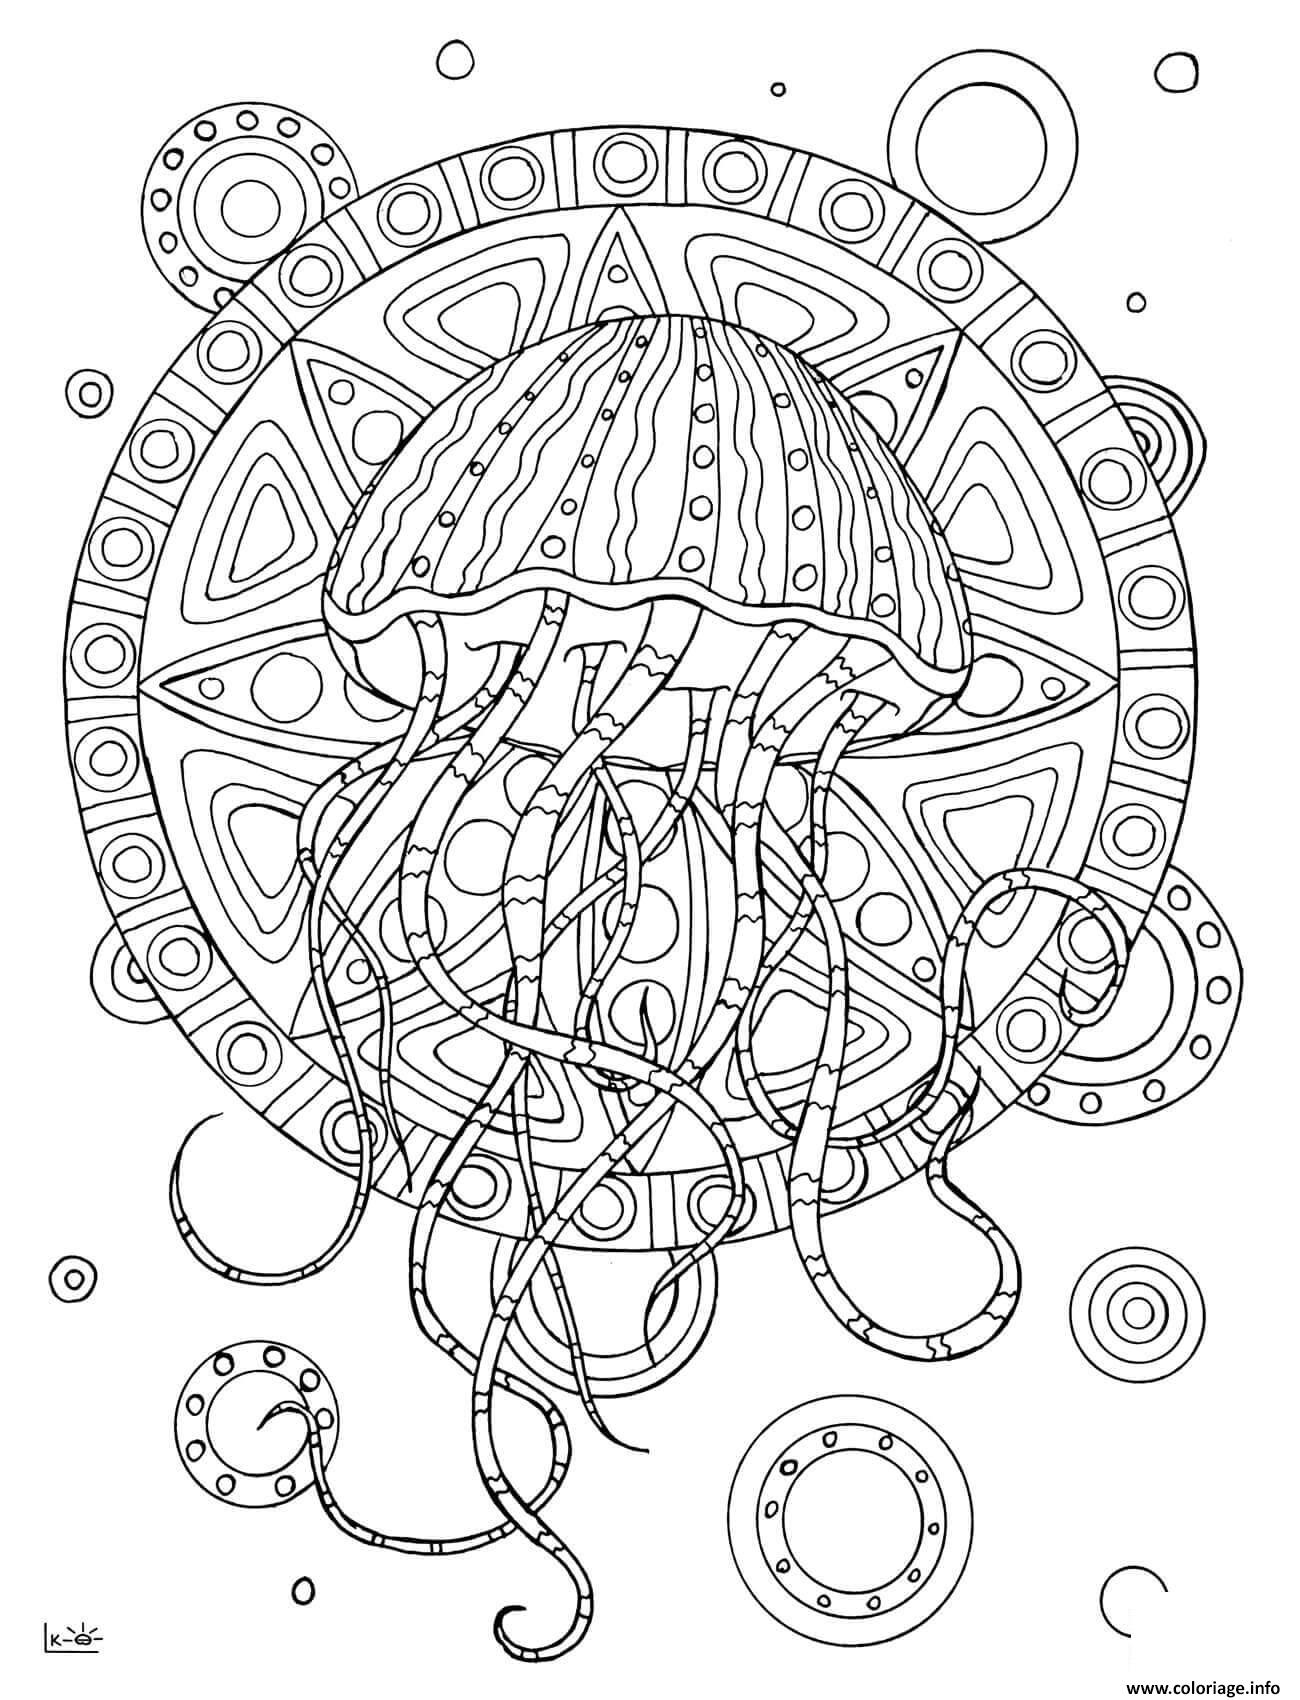 Dessin jellyfish with tribal pattern adulte Coloriage Gratuit à Imprimer